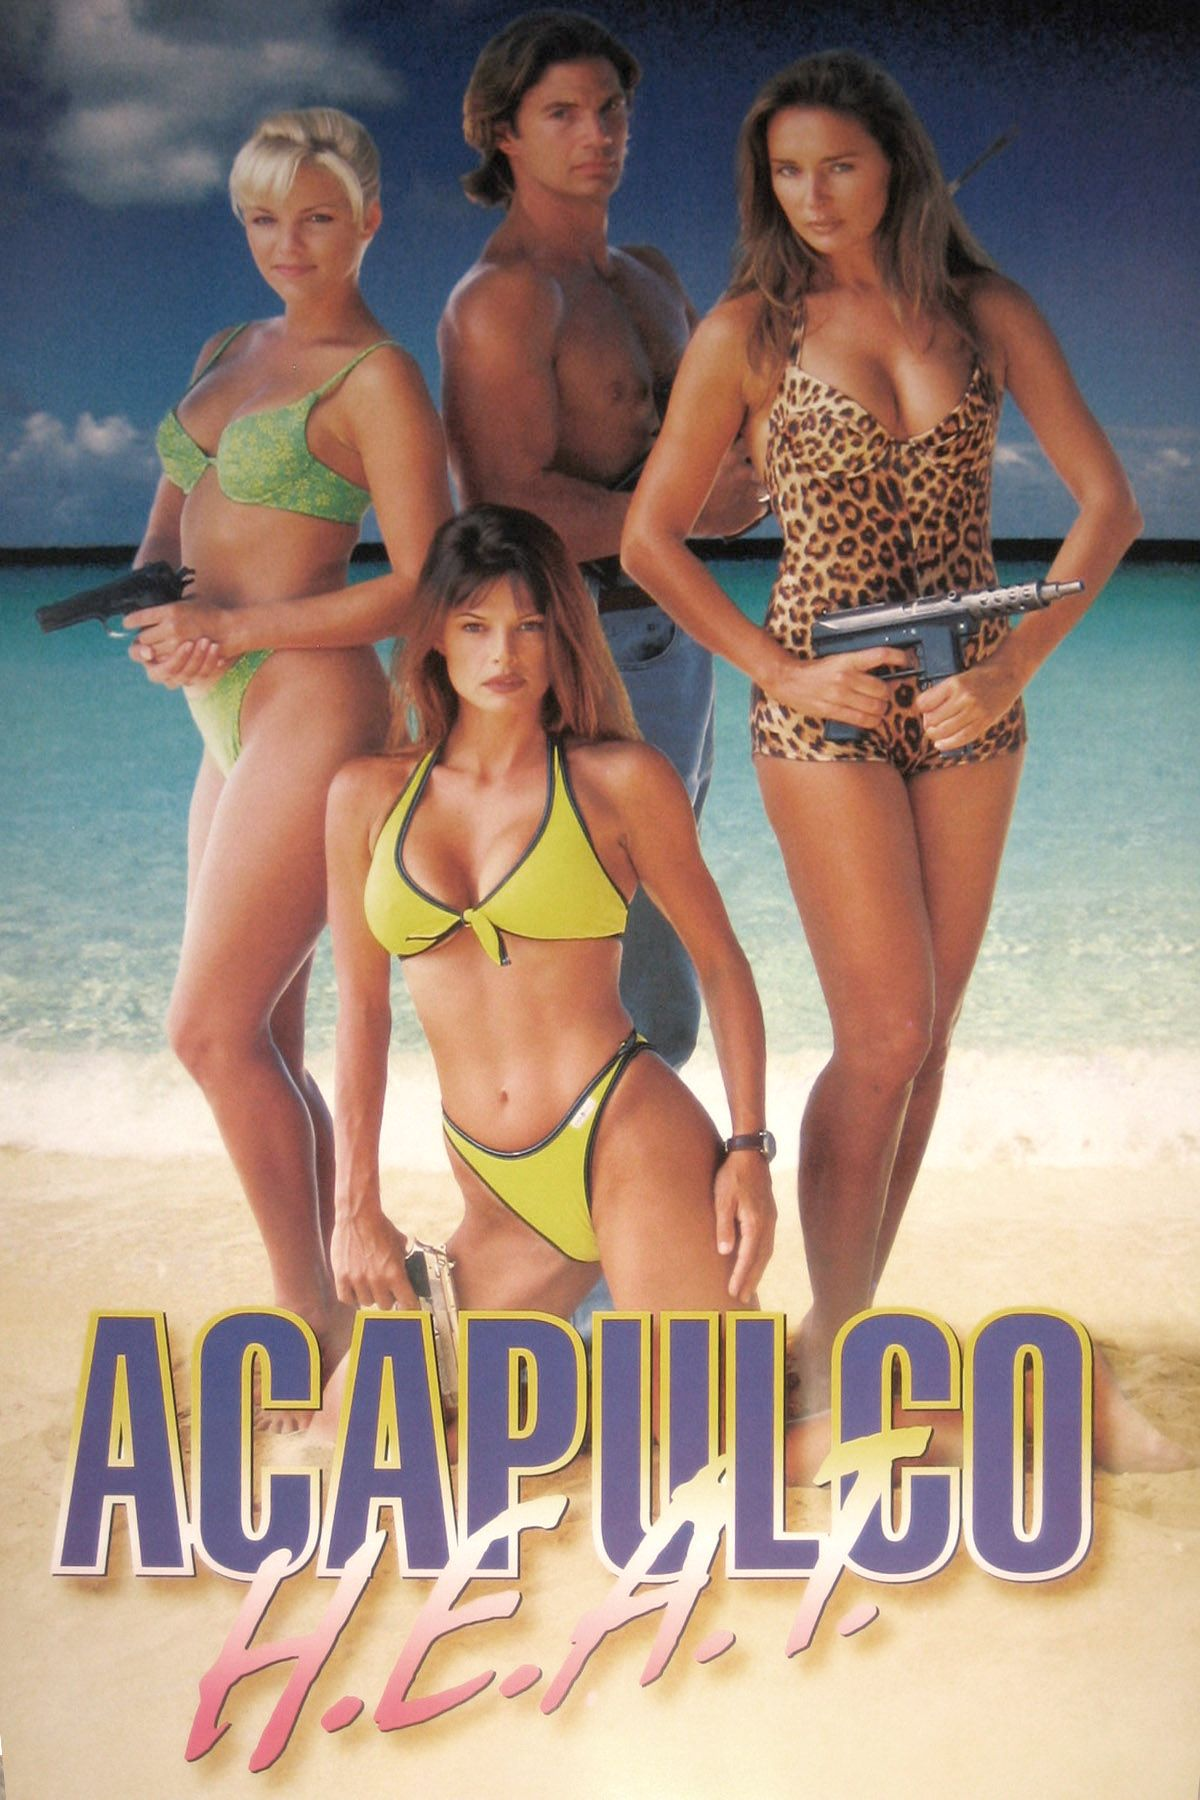 Alison Armitage Photos acapulco heat with alison armitage | beachwear, swimwear